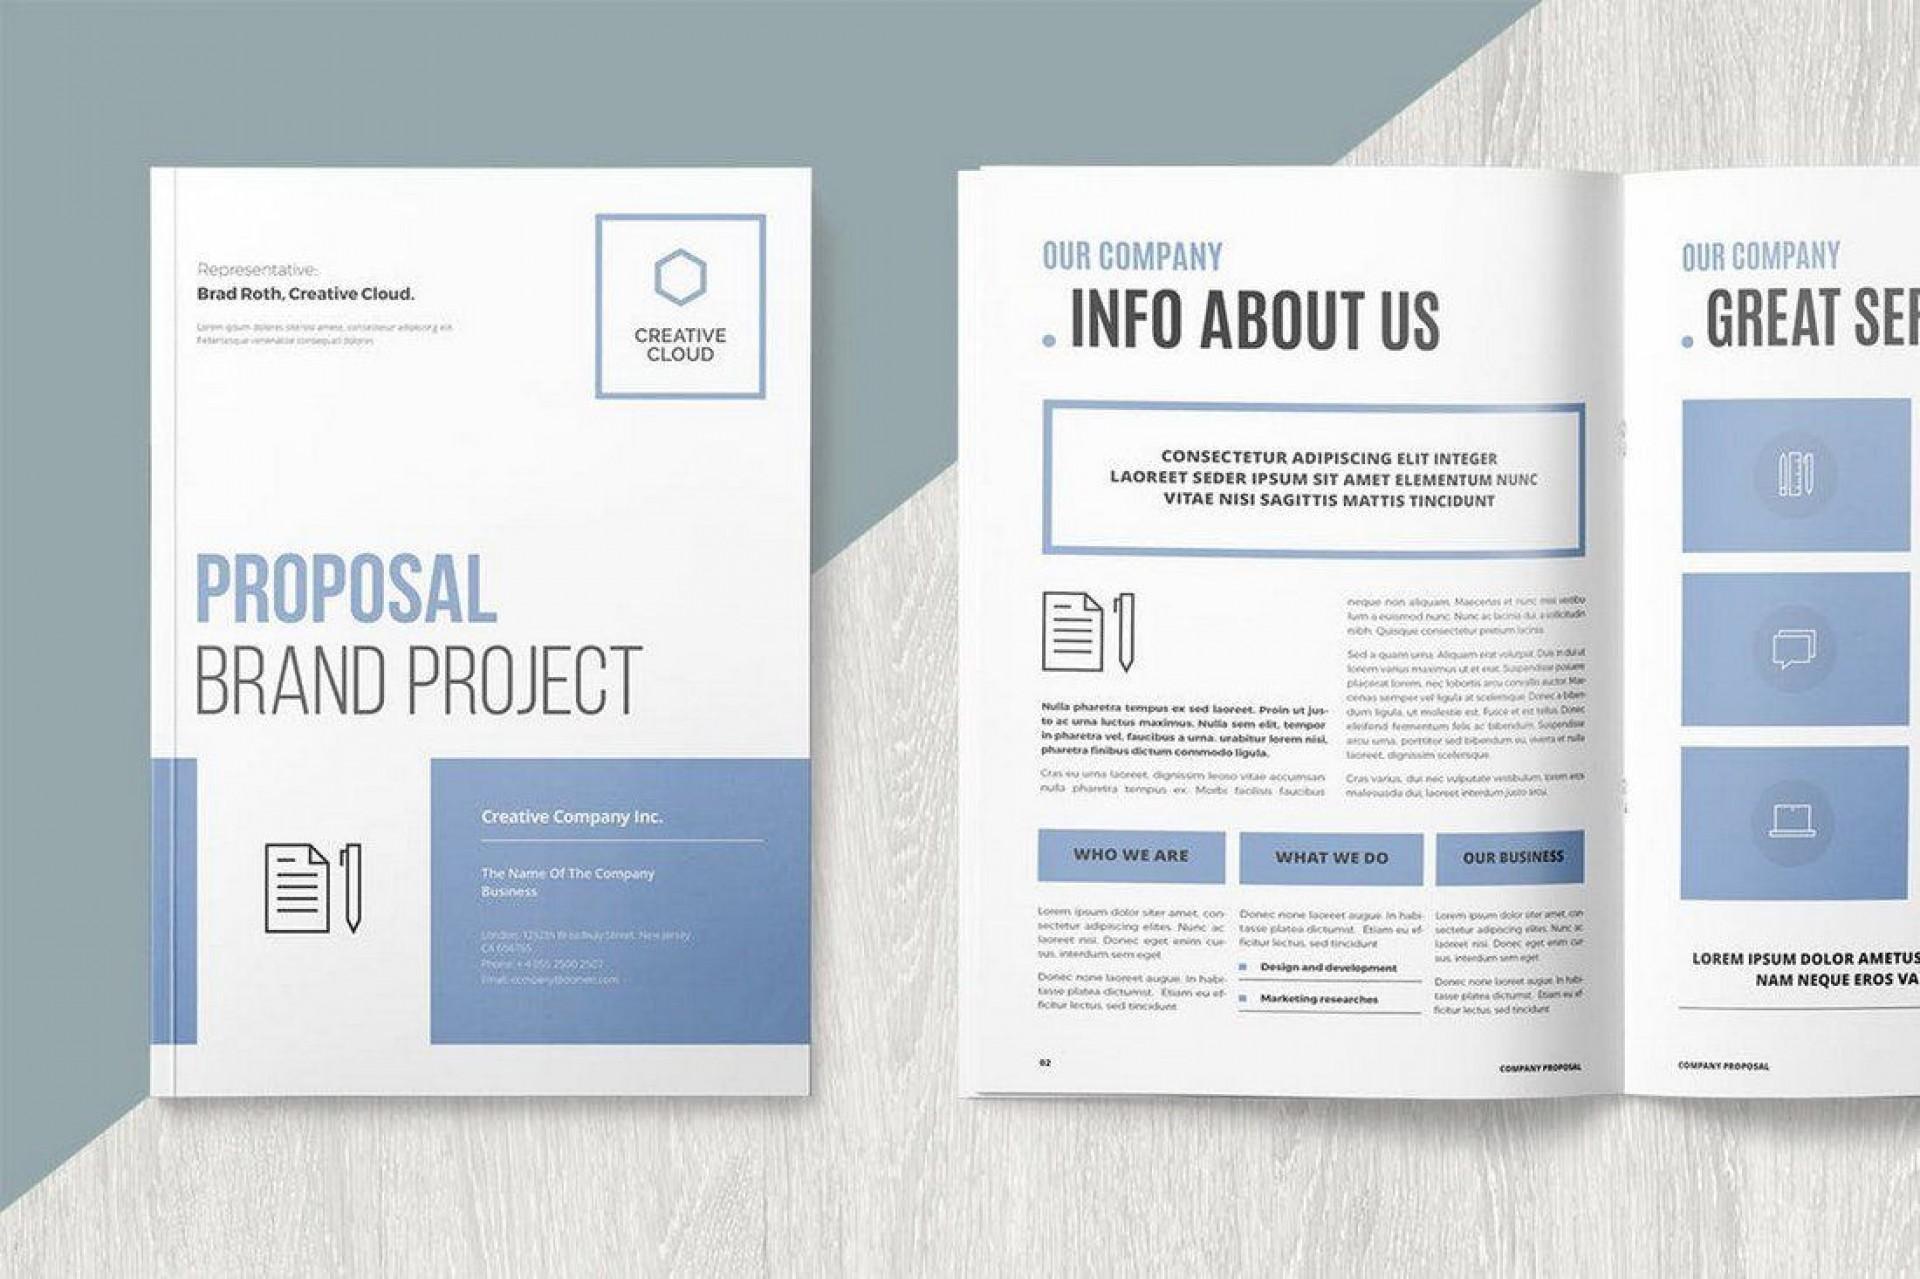 005 Unusual Microsoft Word Design Template Photo  Templates Brochure Free M1920